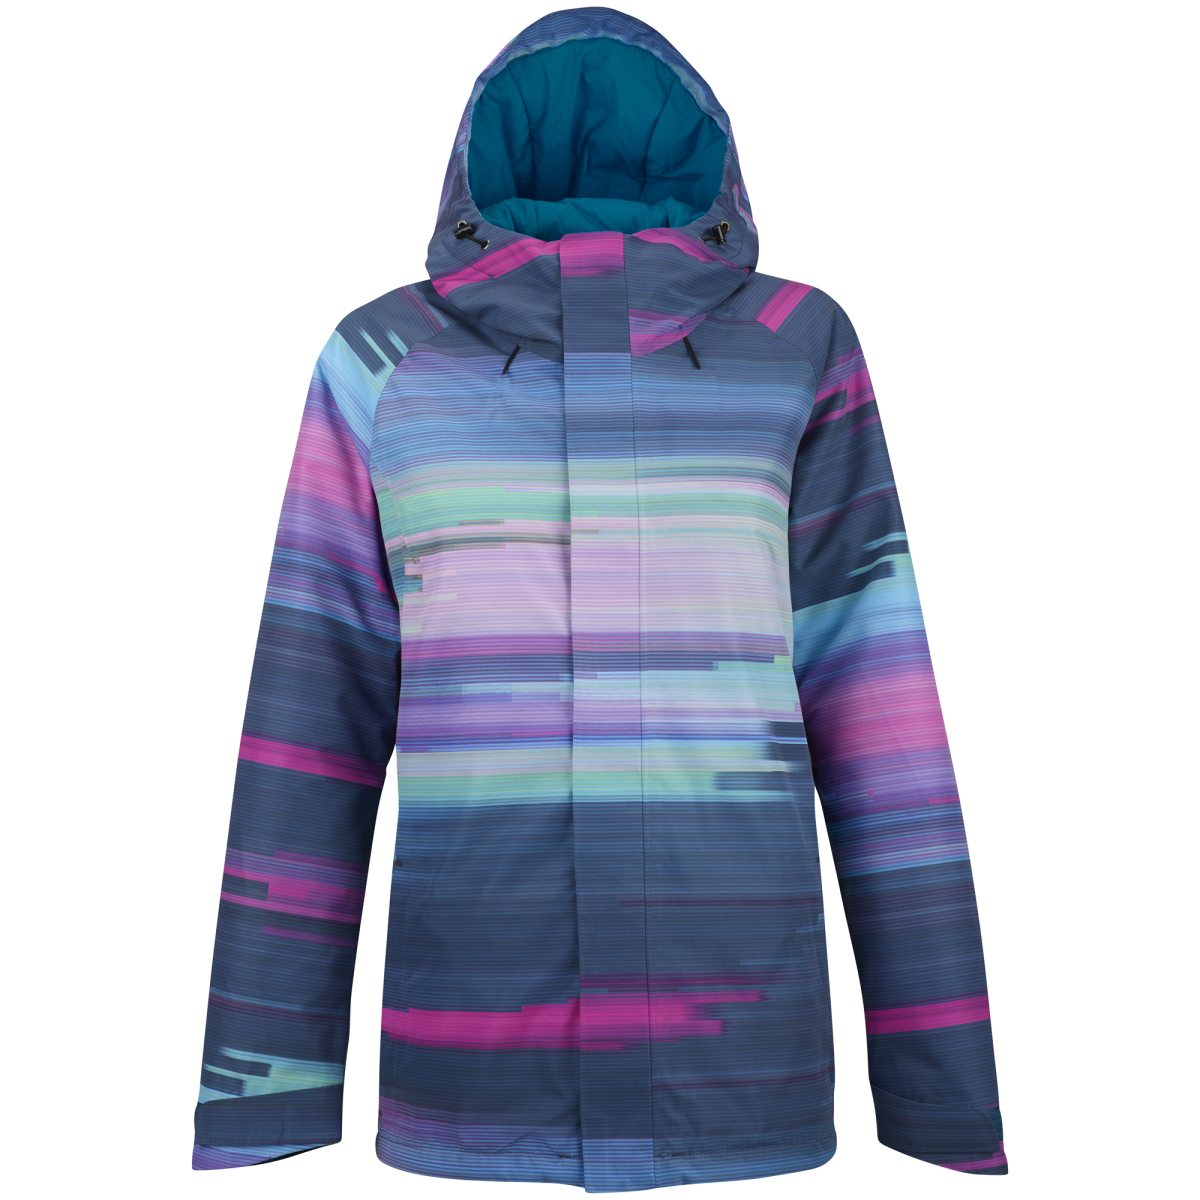 b5cc3be9 burton rubix jacket snowboardjakke dame ski og snowboardjakker no